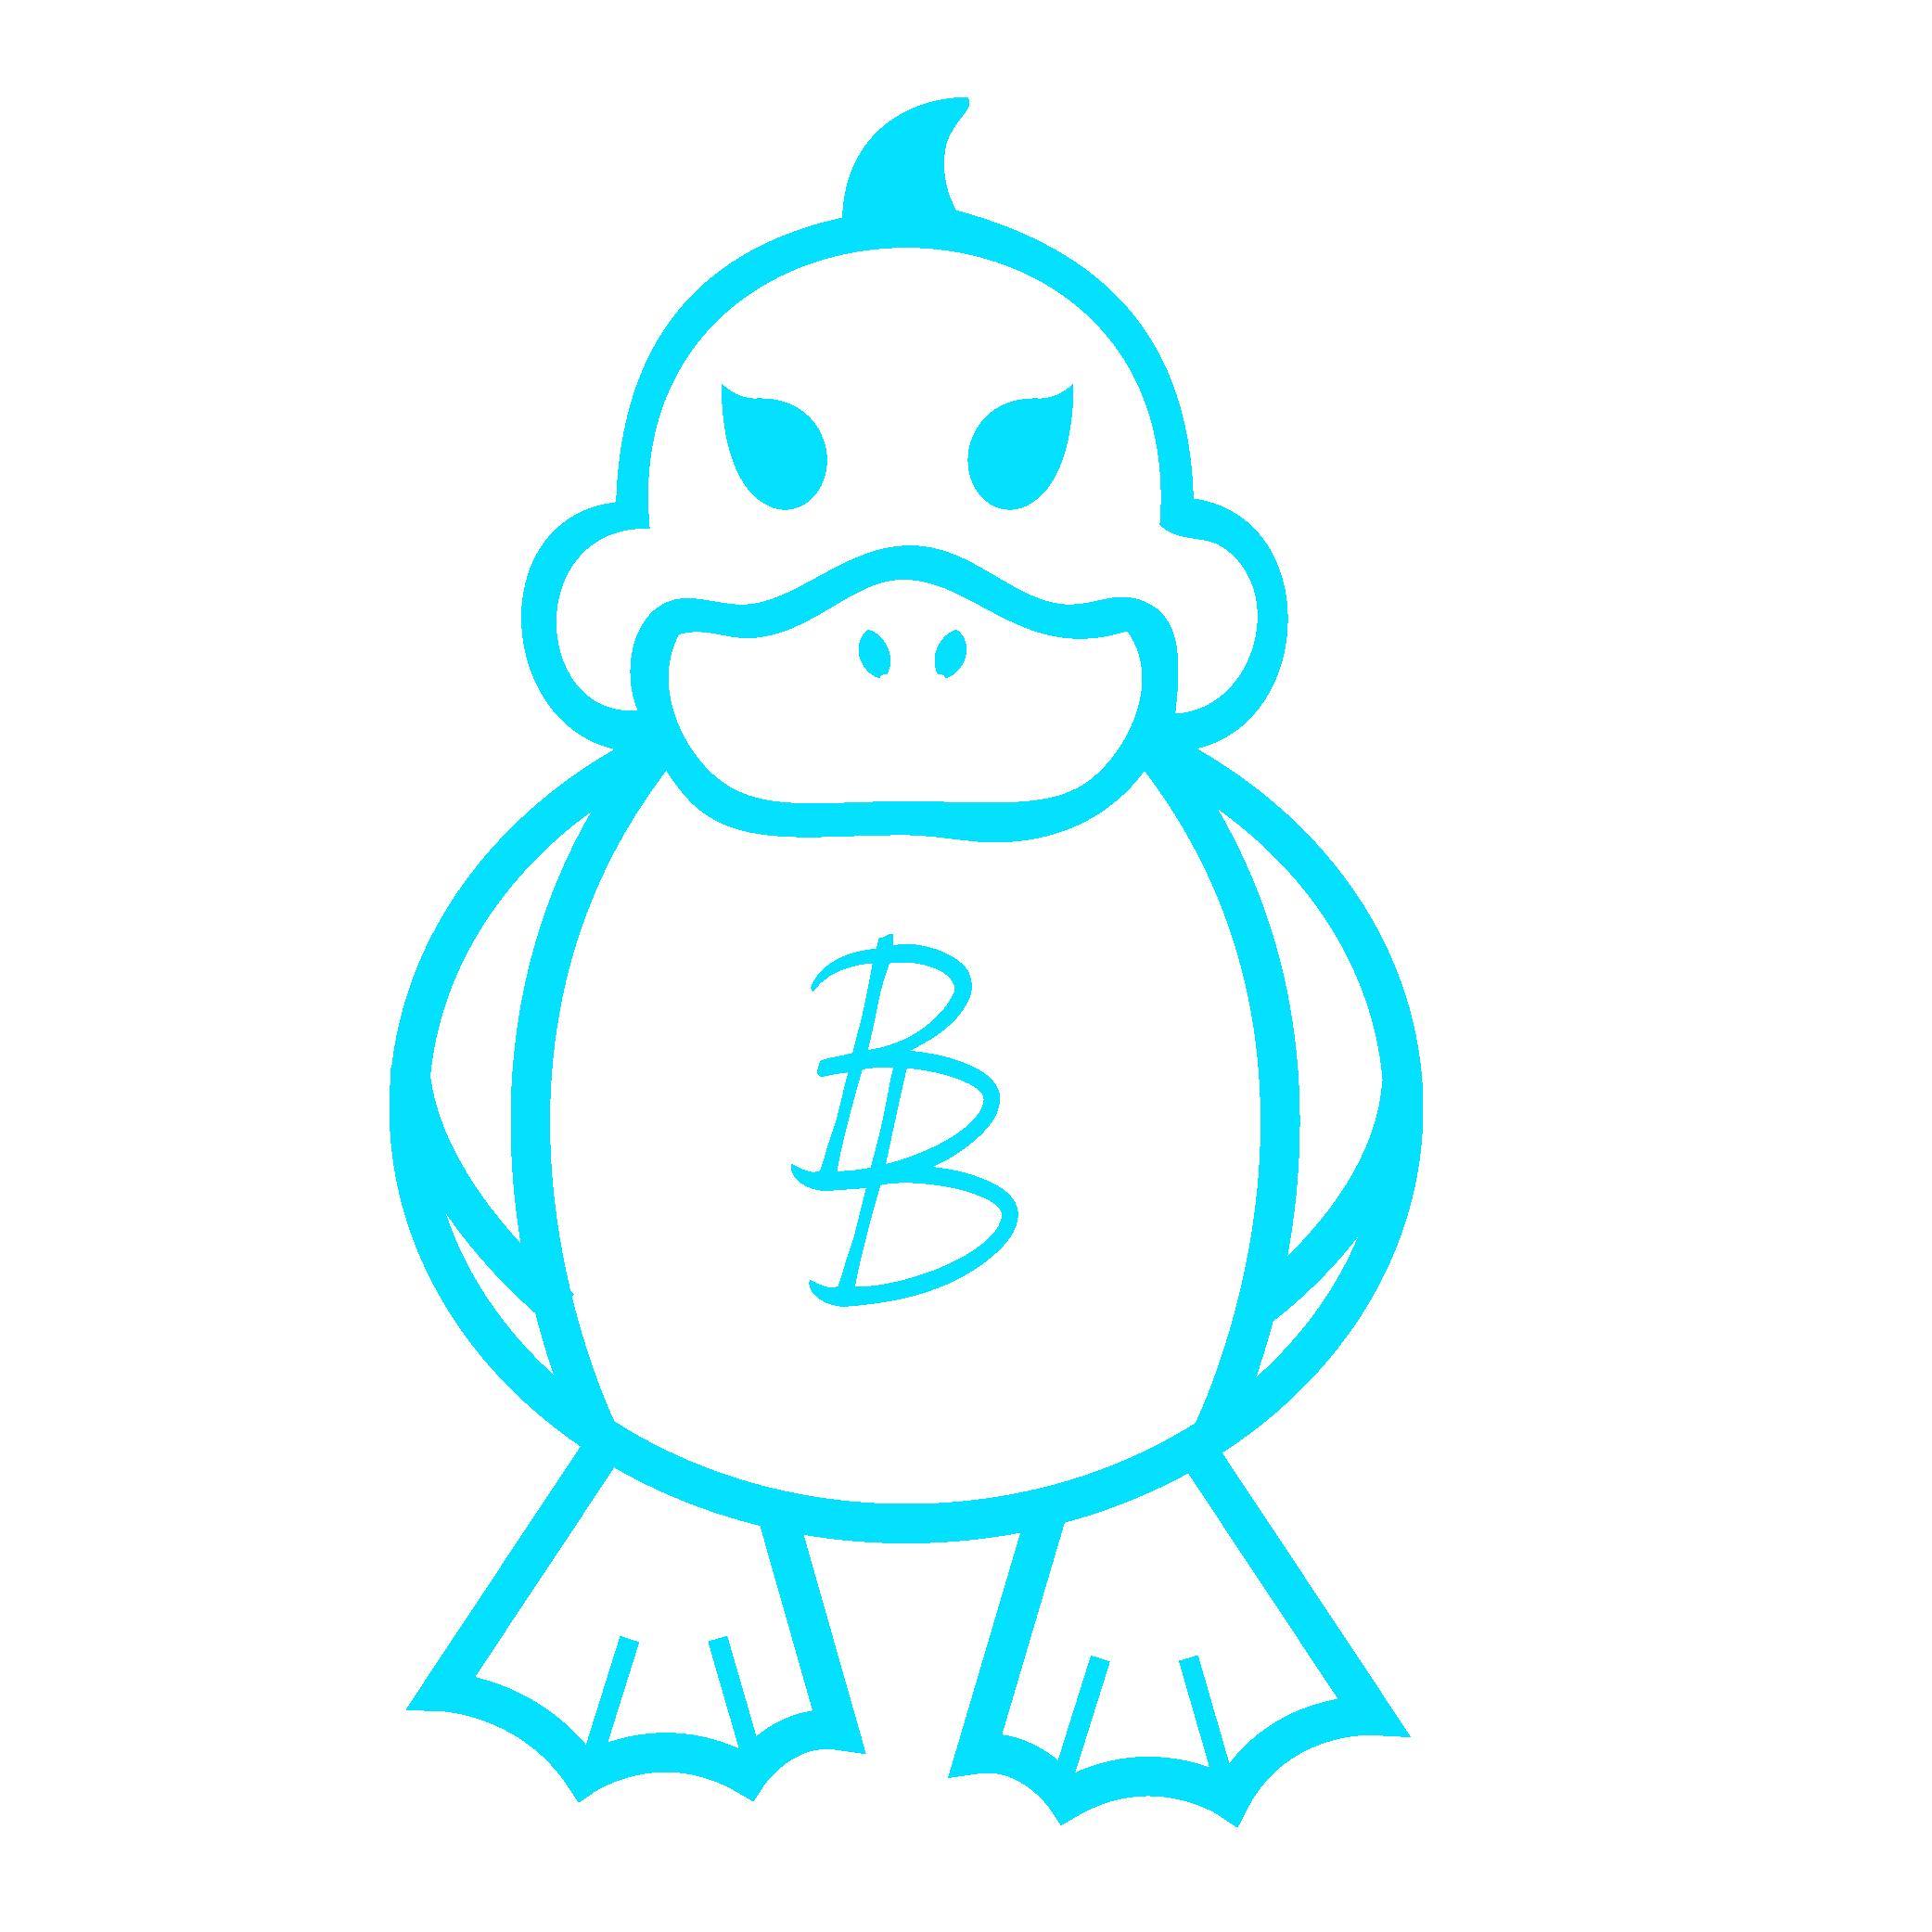 logo bbhex